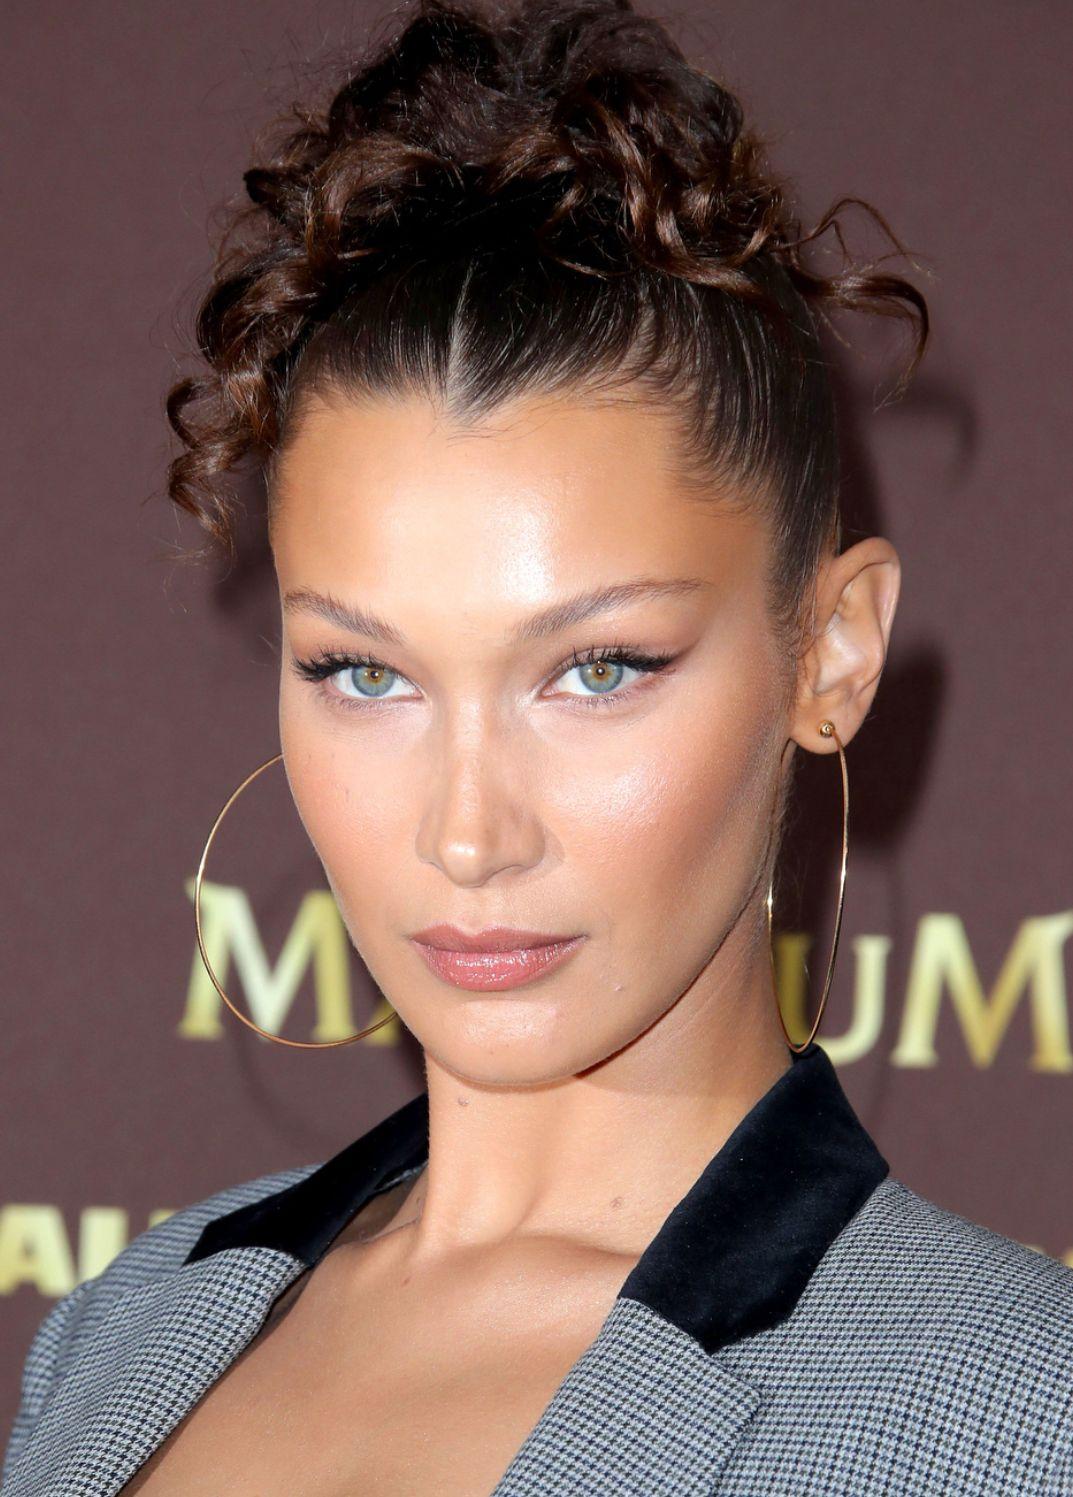 f1d232be0a9b5 Bella Hadid glowy summer makeup look with gold earrings hoops #BellaHadid  #makeup #bronzer